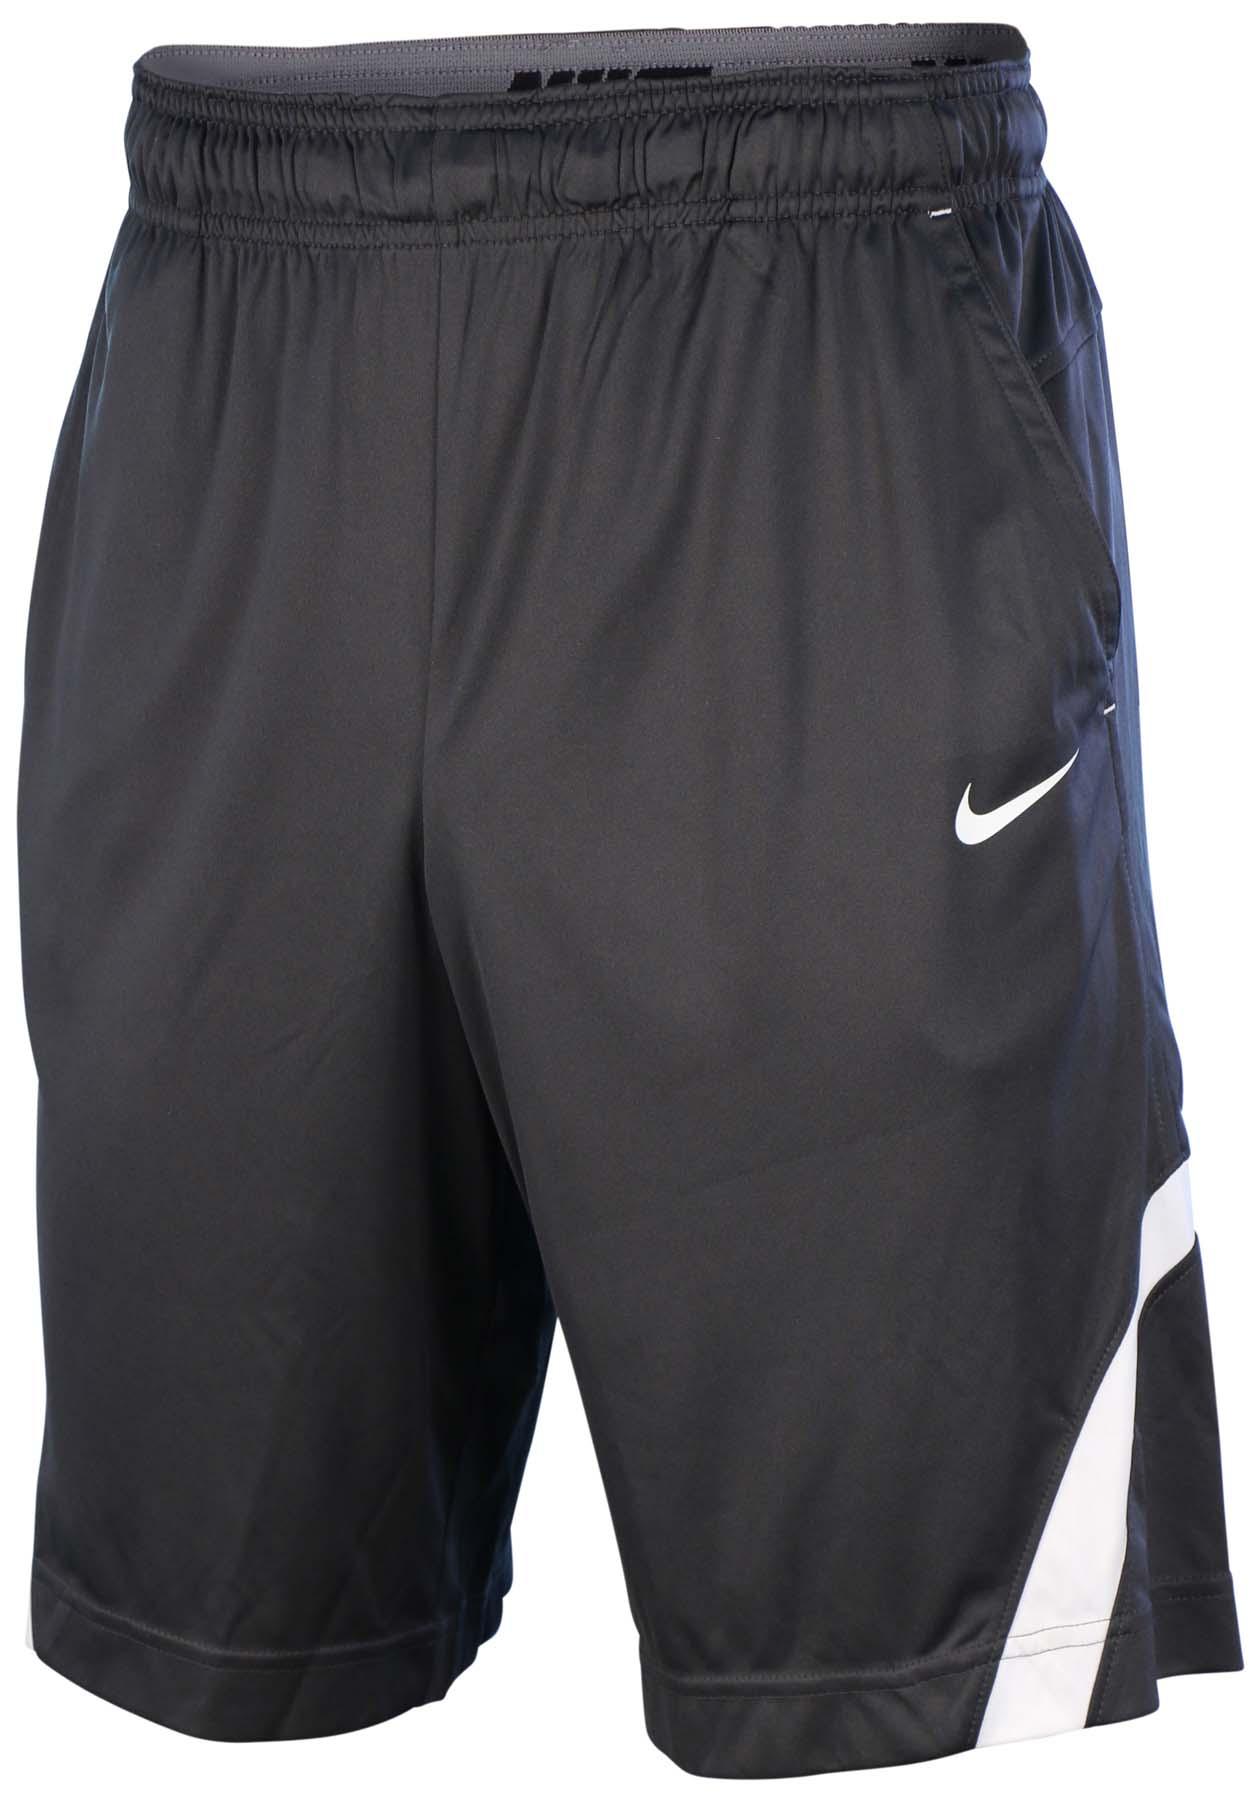 Nike Men's Dri Fit 3 Pocket Coaches Shorts | eBay